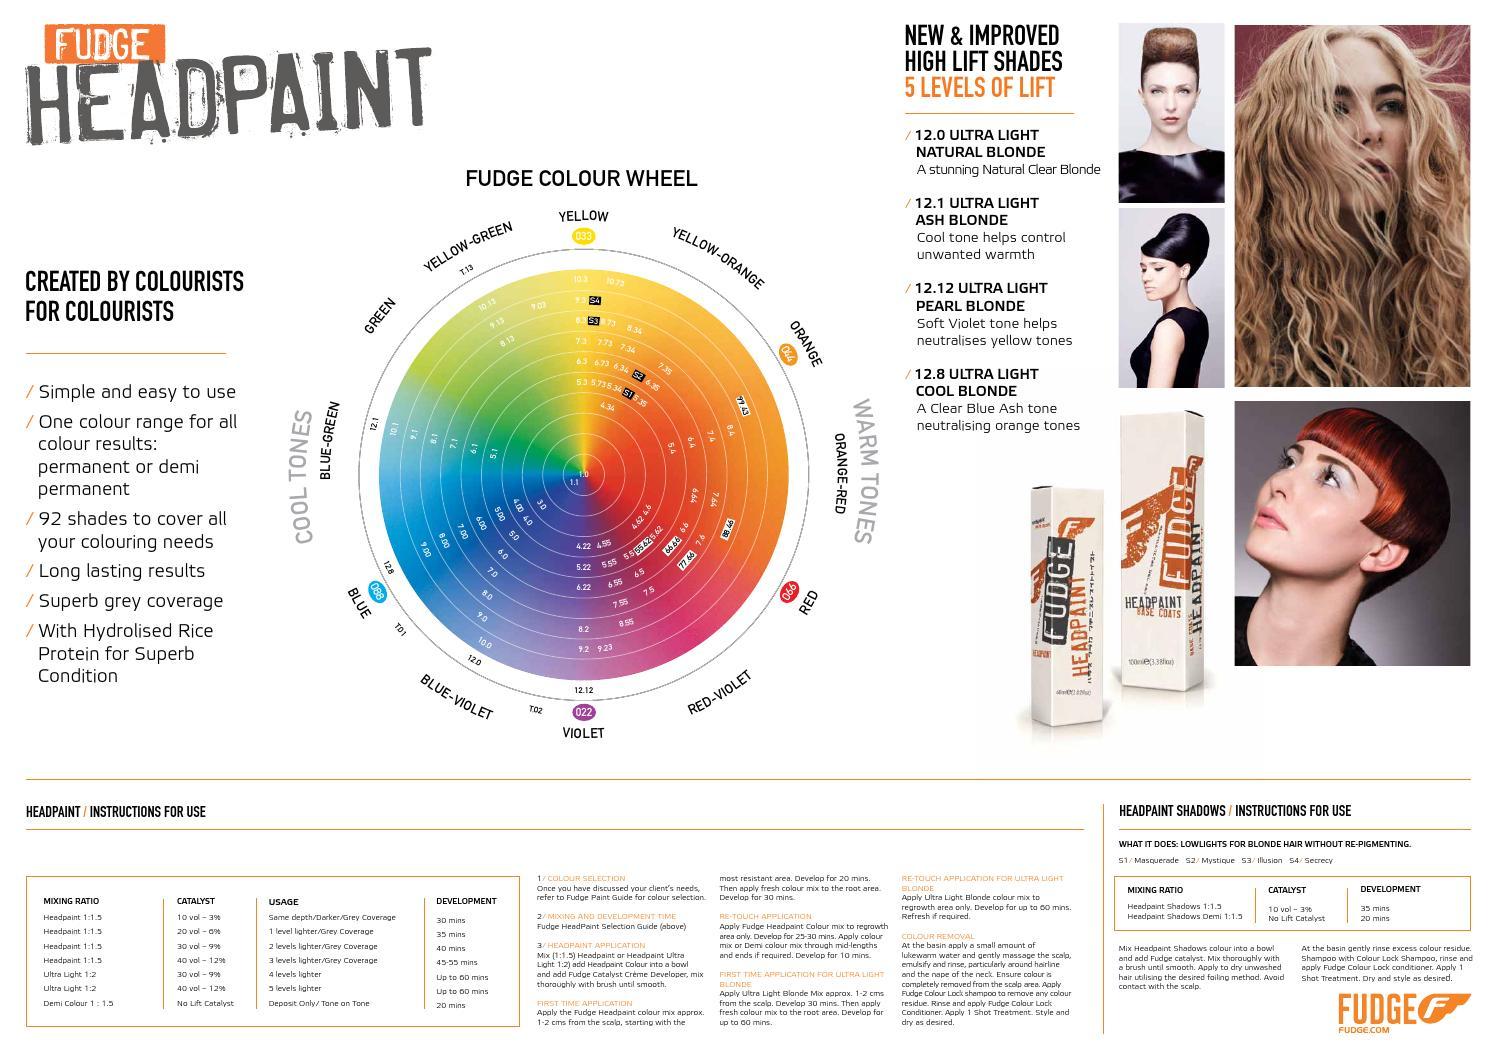 Fudge Headpaint Salon Wall Chart By Fudge Hair Issuu